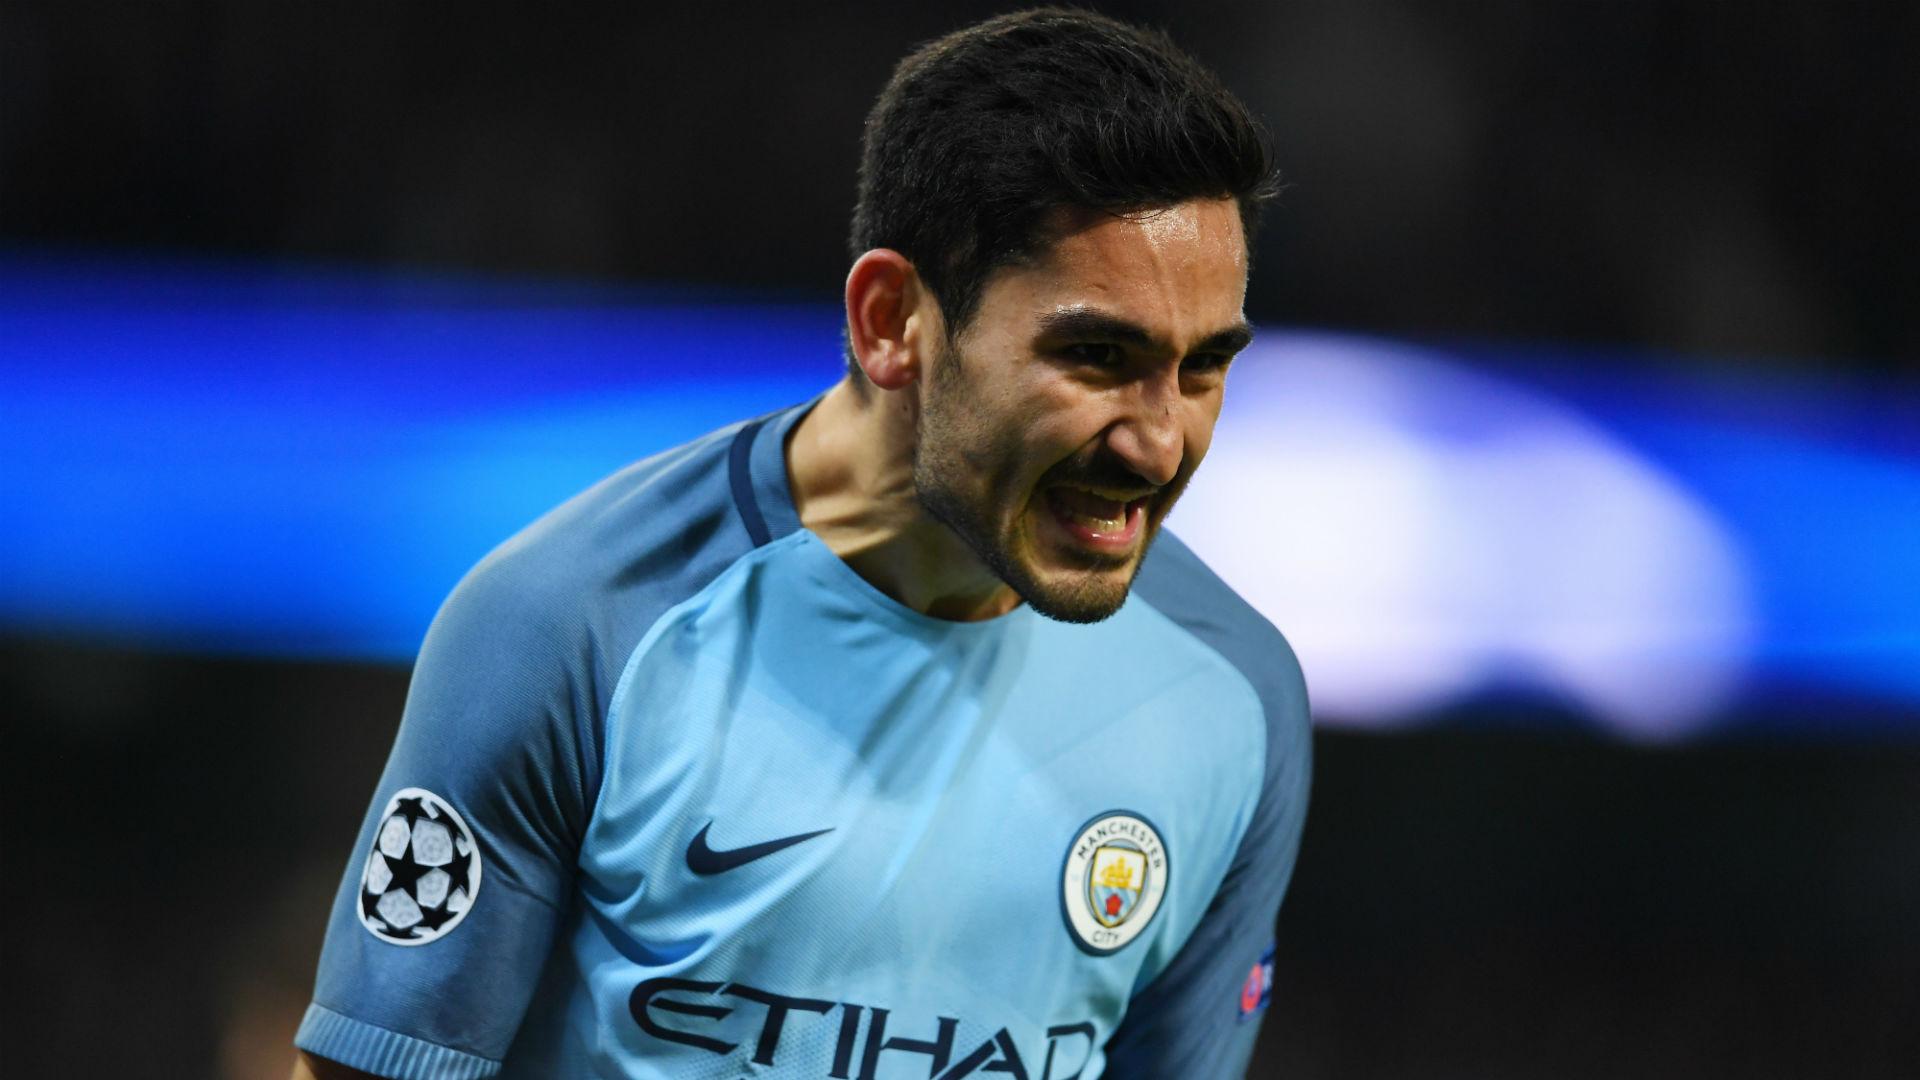 'We pretended it wasn't Barca' - Manchester City striker Sergio Aguero